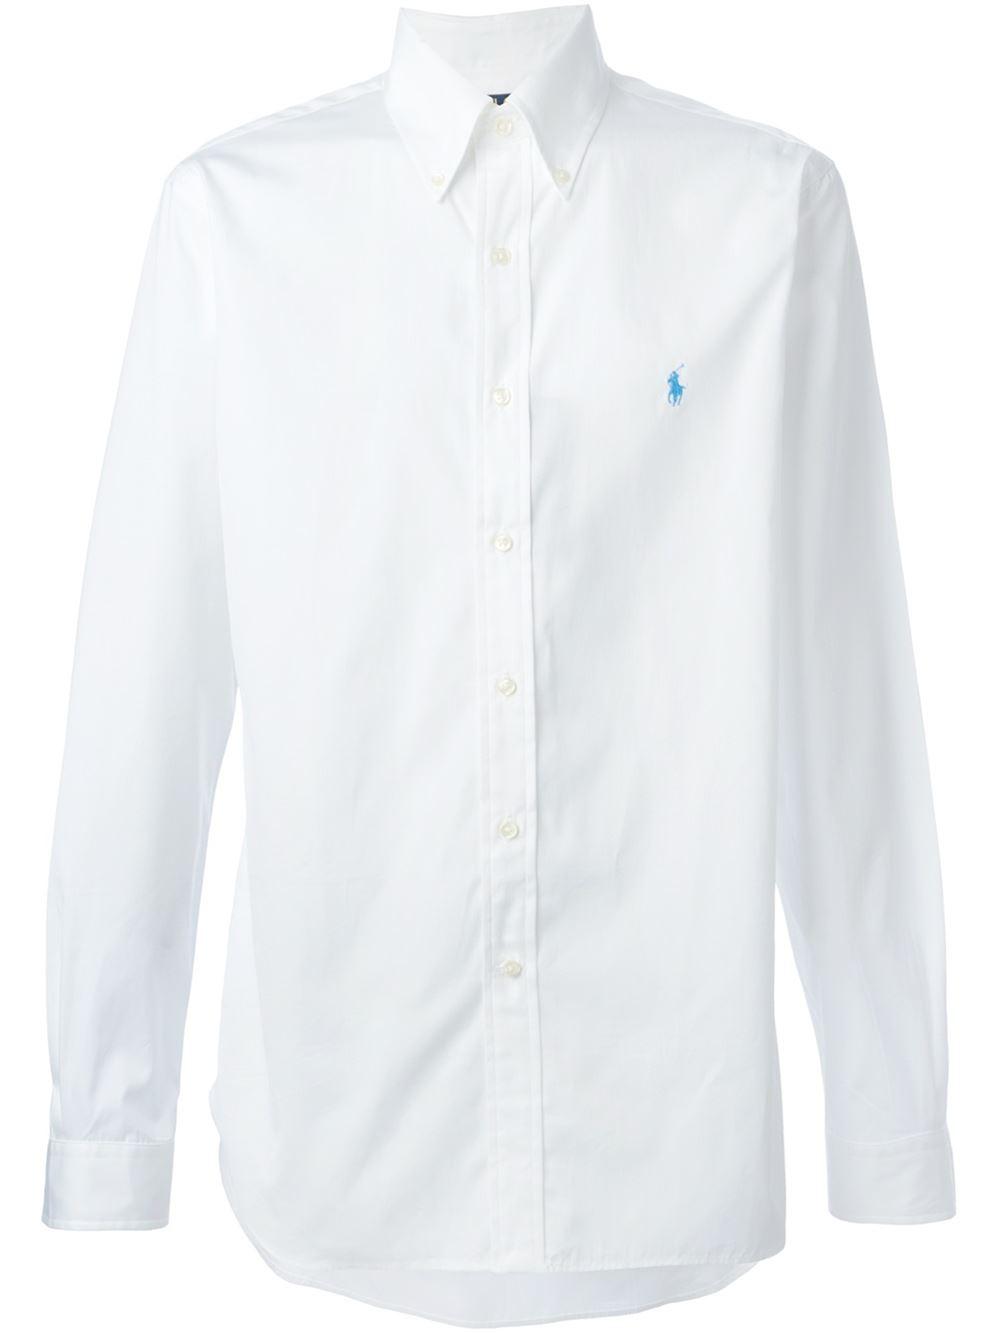 Polo ralph lauren button down shirt in white for men lyst for White button down shirt mens